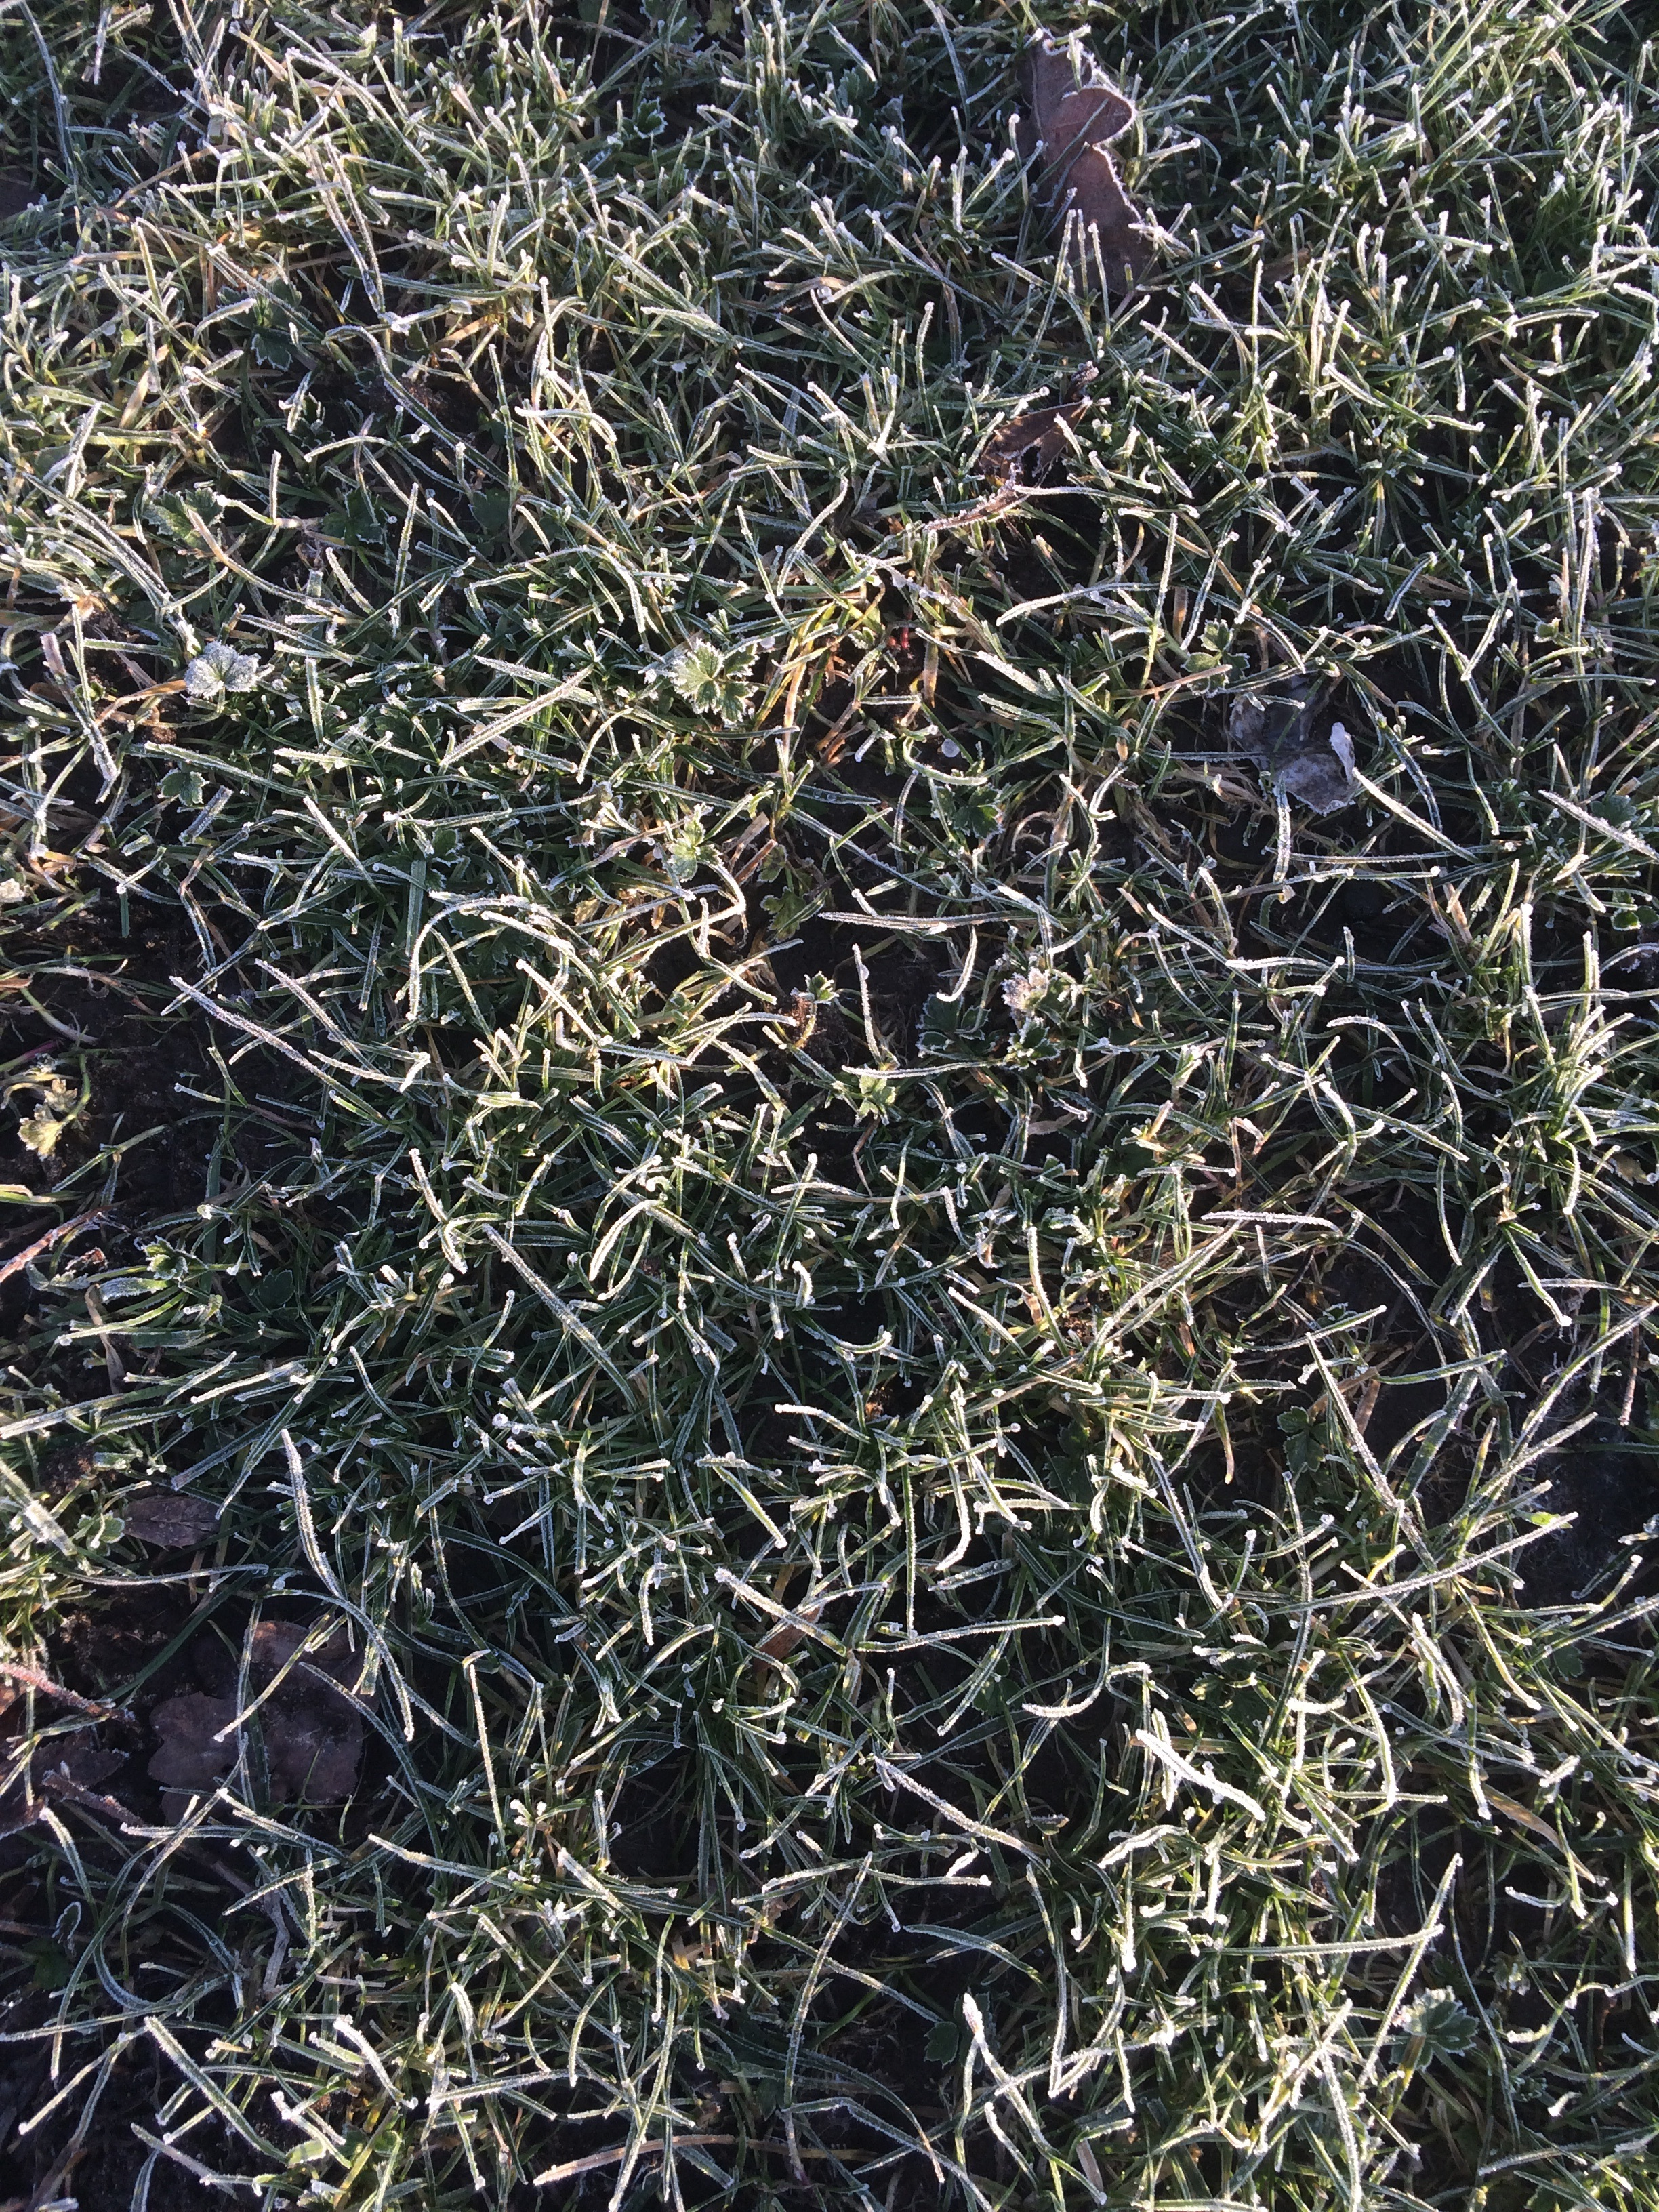 Frosty grass in Woolston park